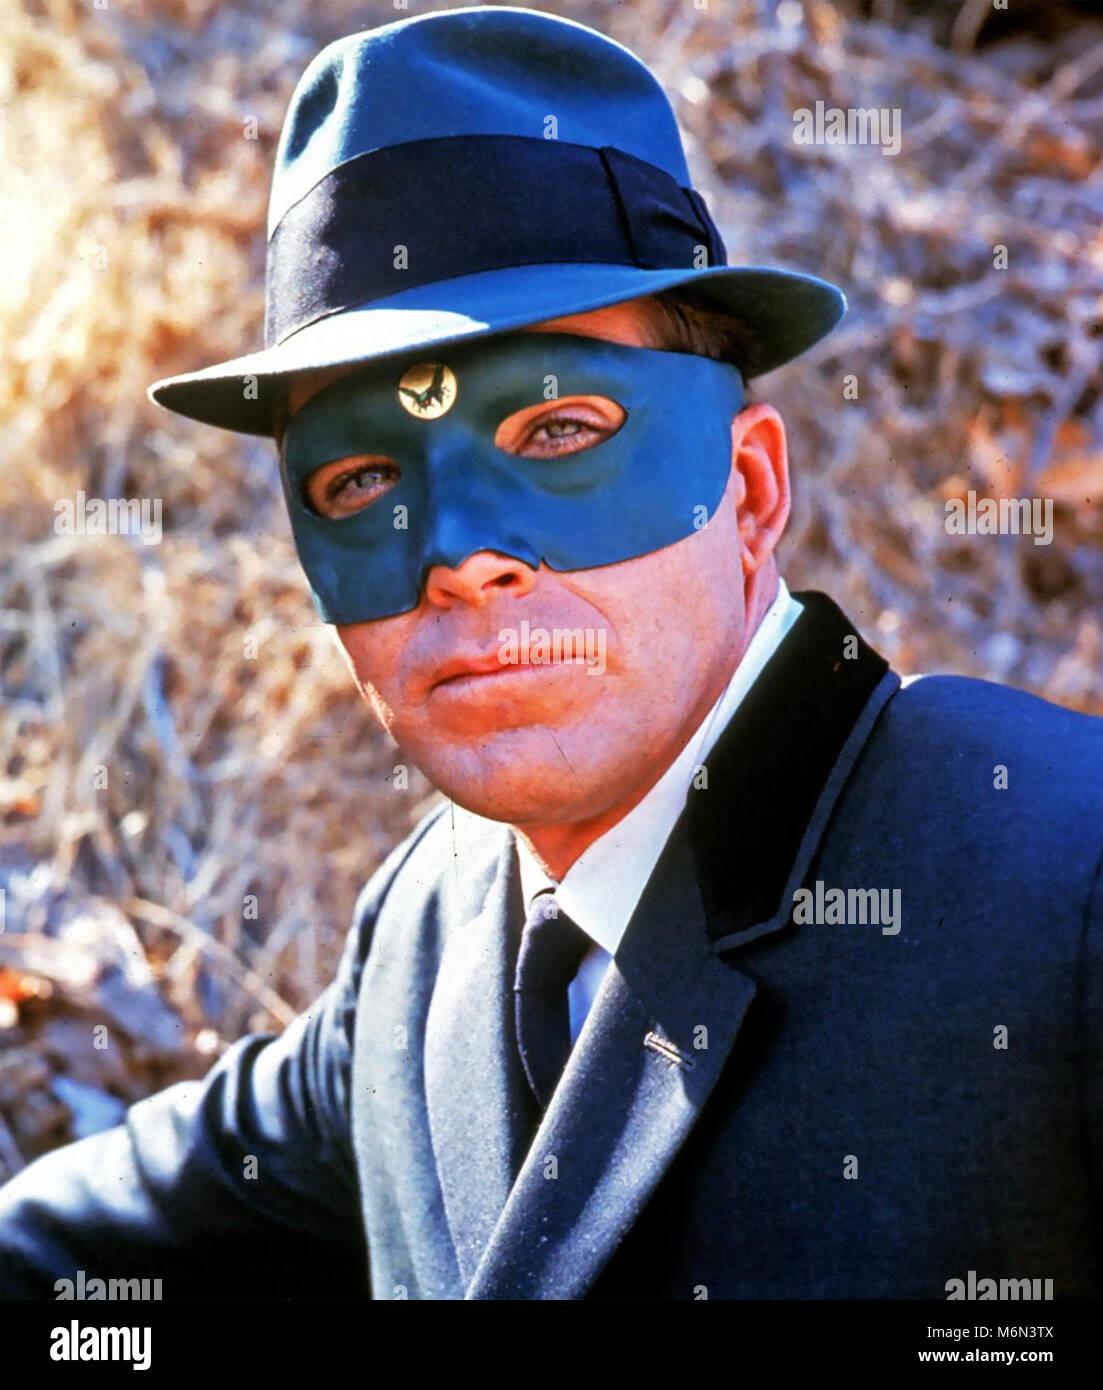 THE GREEN HORNET American ABC TV series 1966-1967 with Van Williams as the Green Hornet Britt Reid - Stock Image